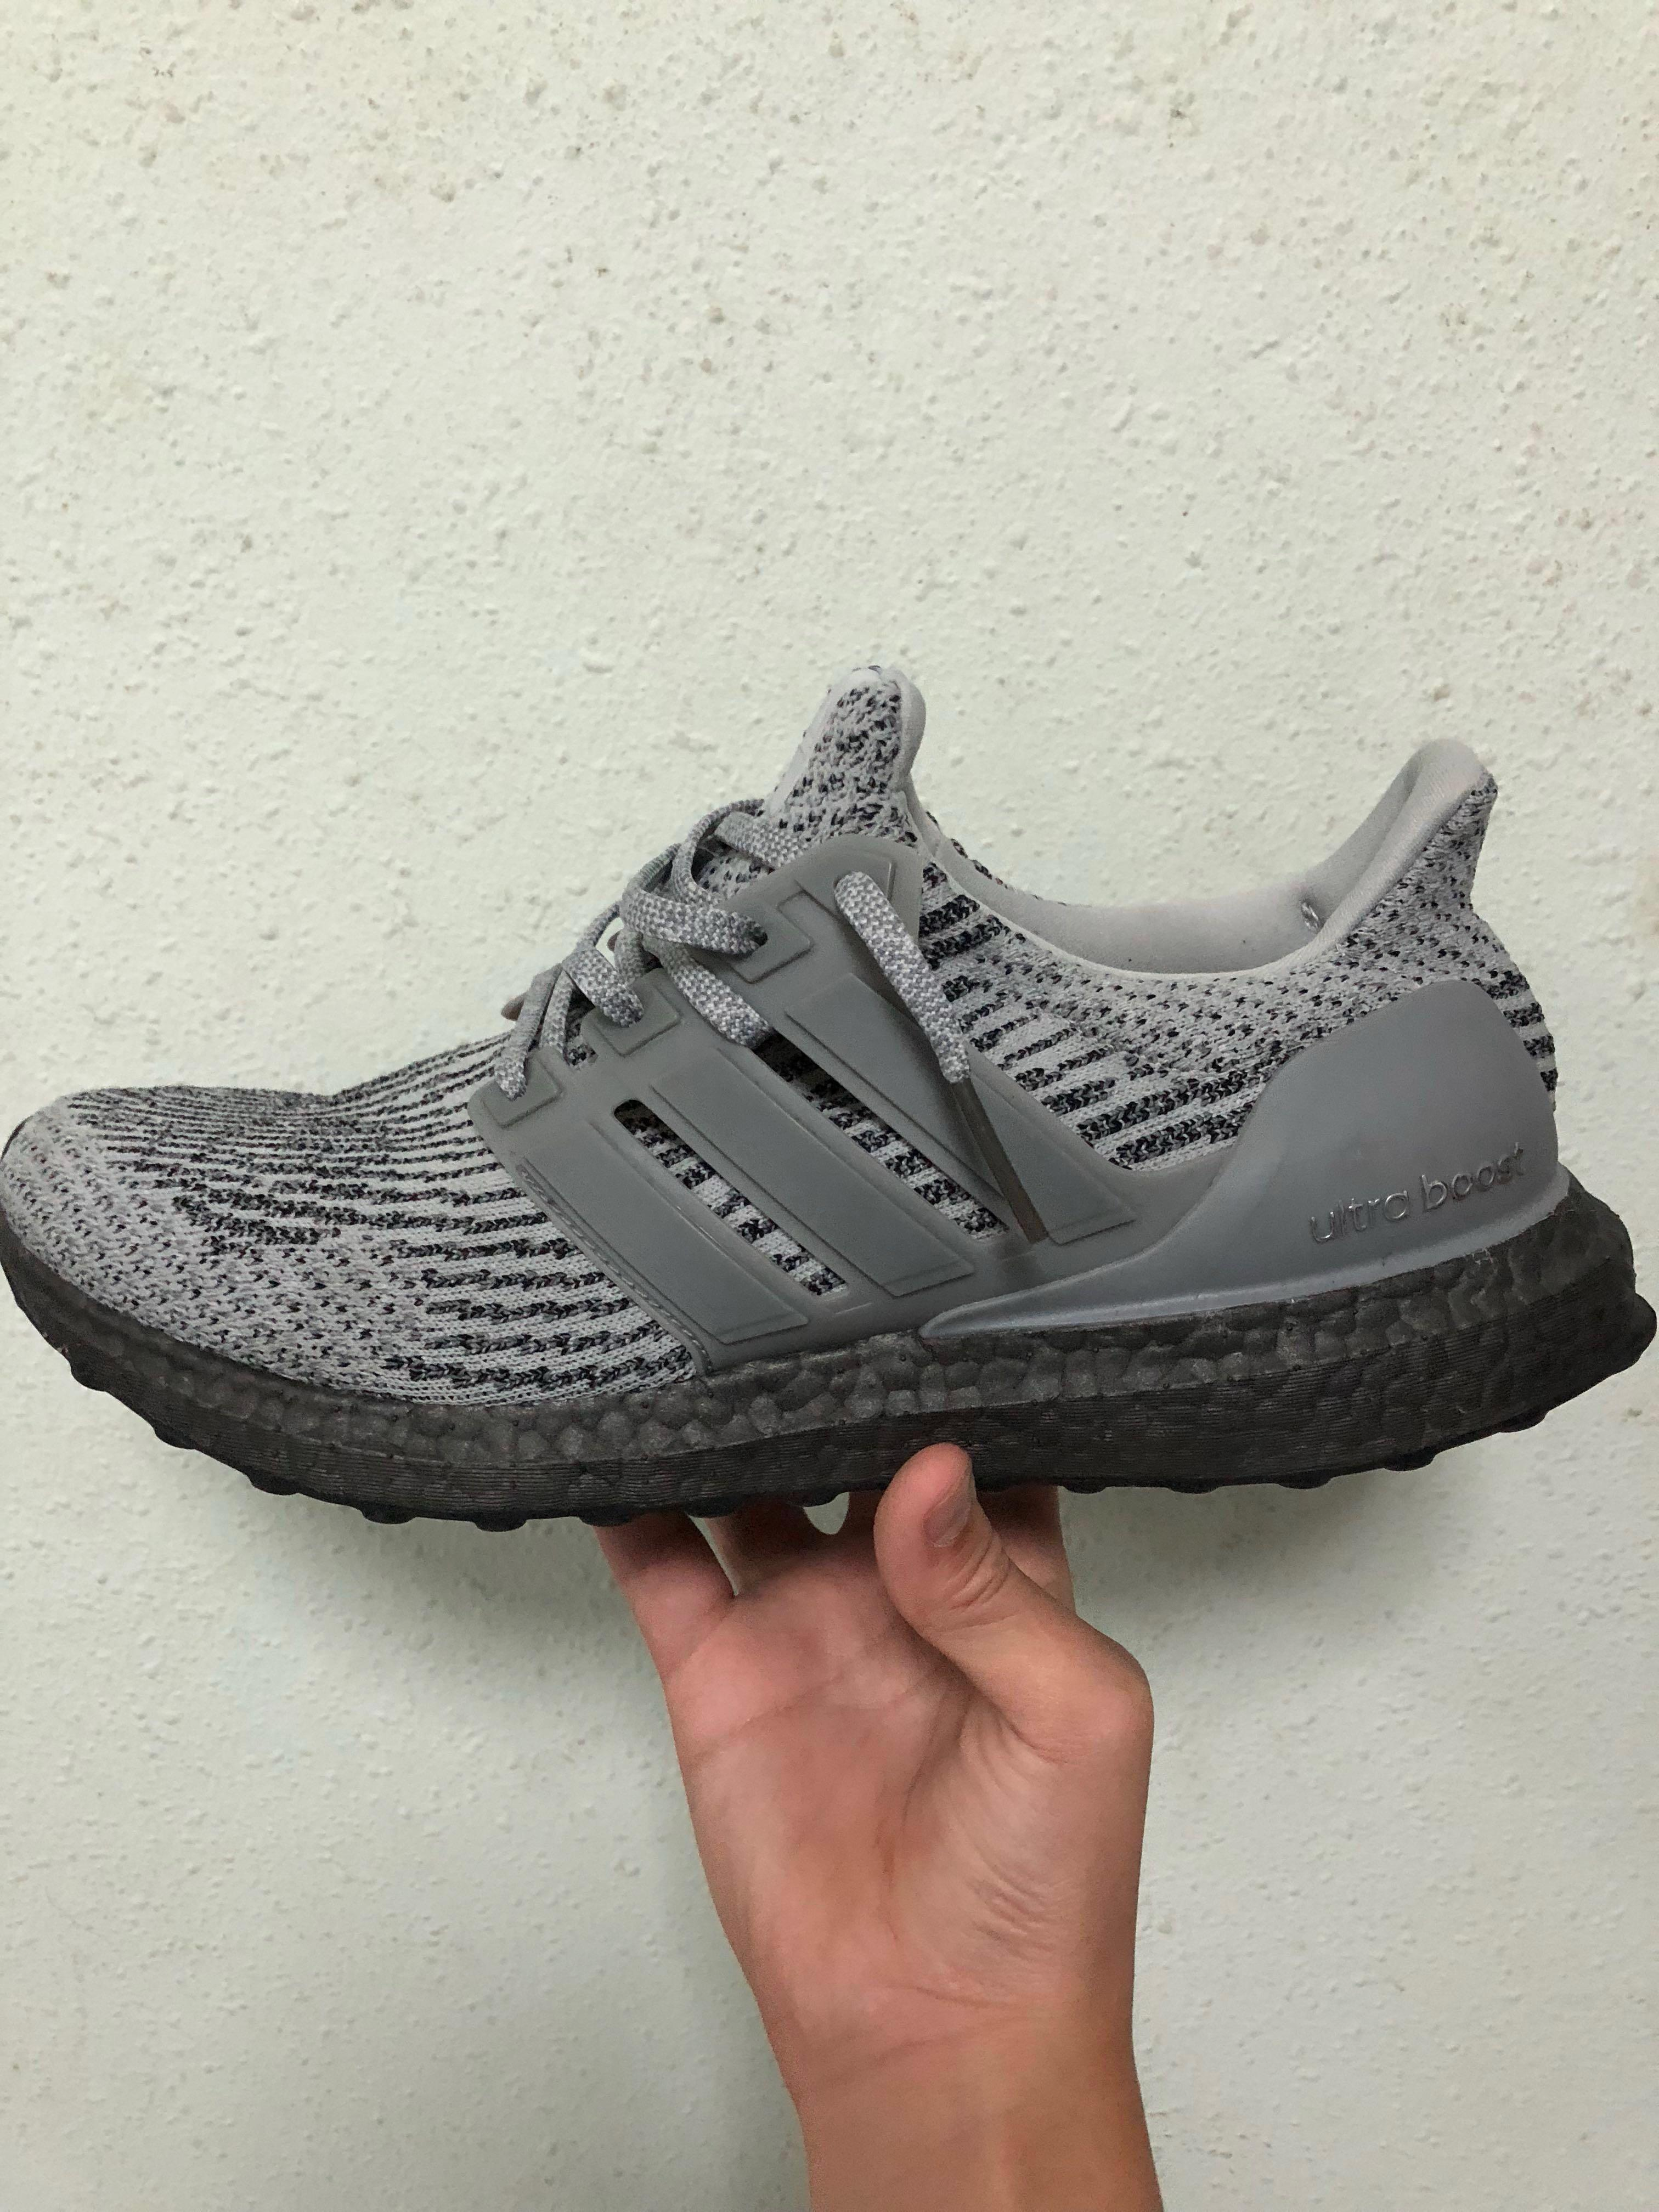 Adidas UltraBoost 3.0 Triple Grey, Men's Fashion, Footwear